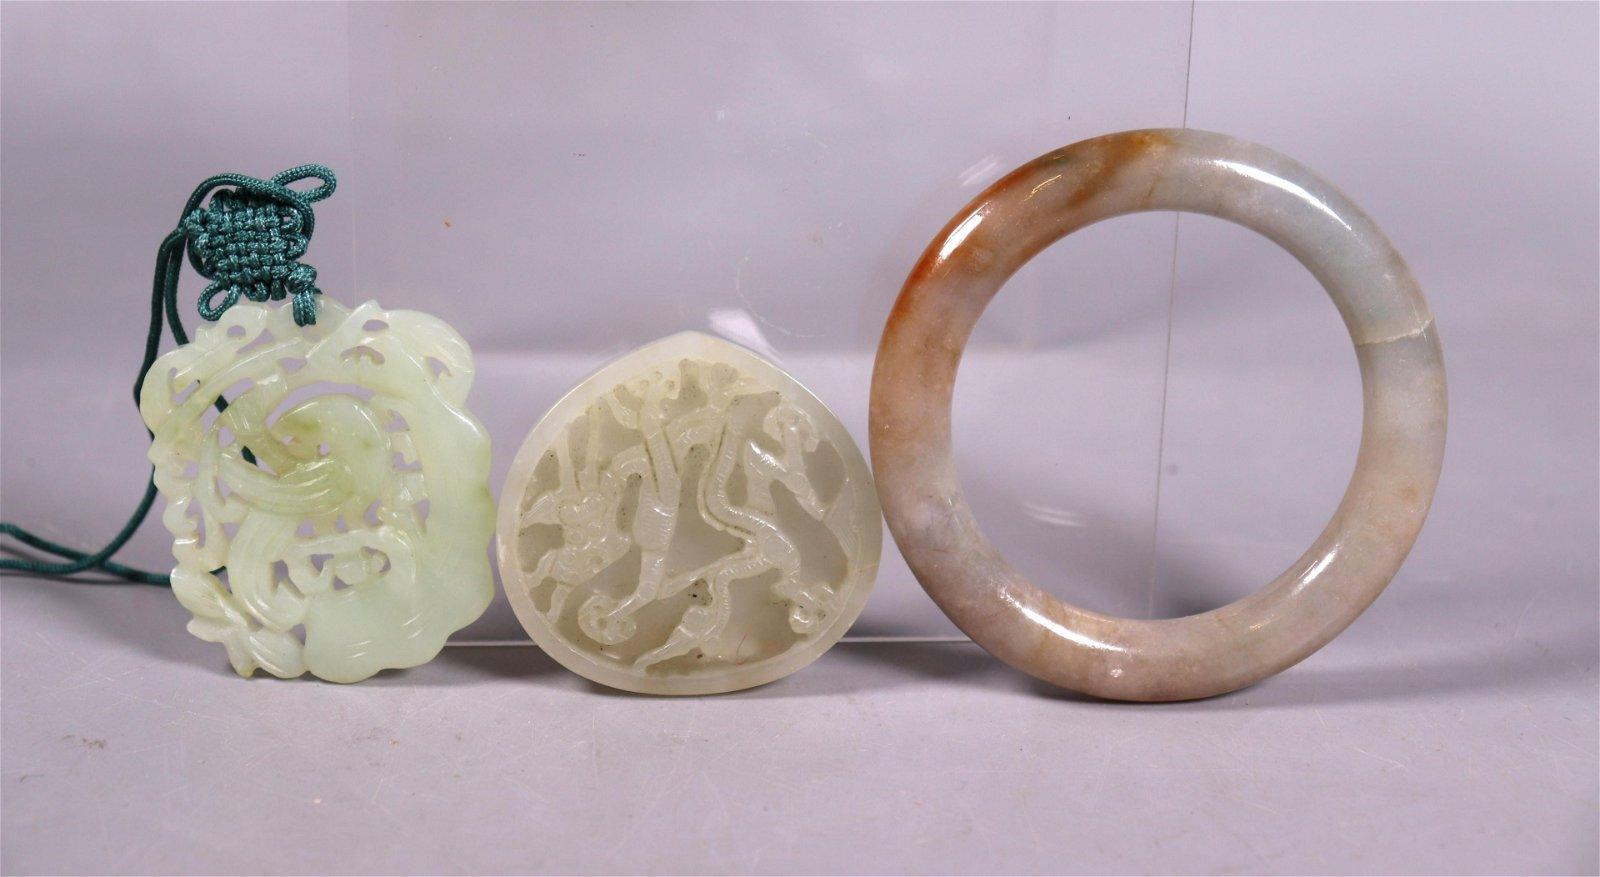 Chinese Jade Plaque Jadeite Bangle Bird Pendant